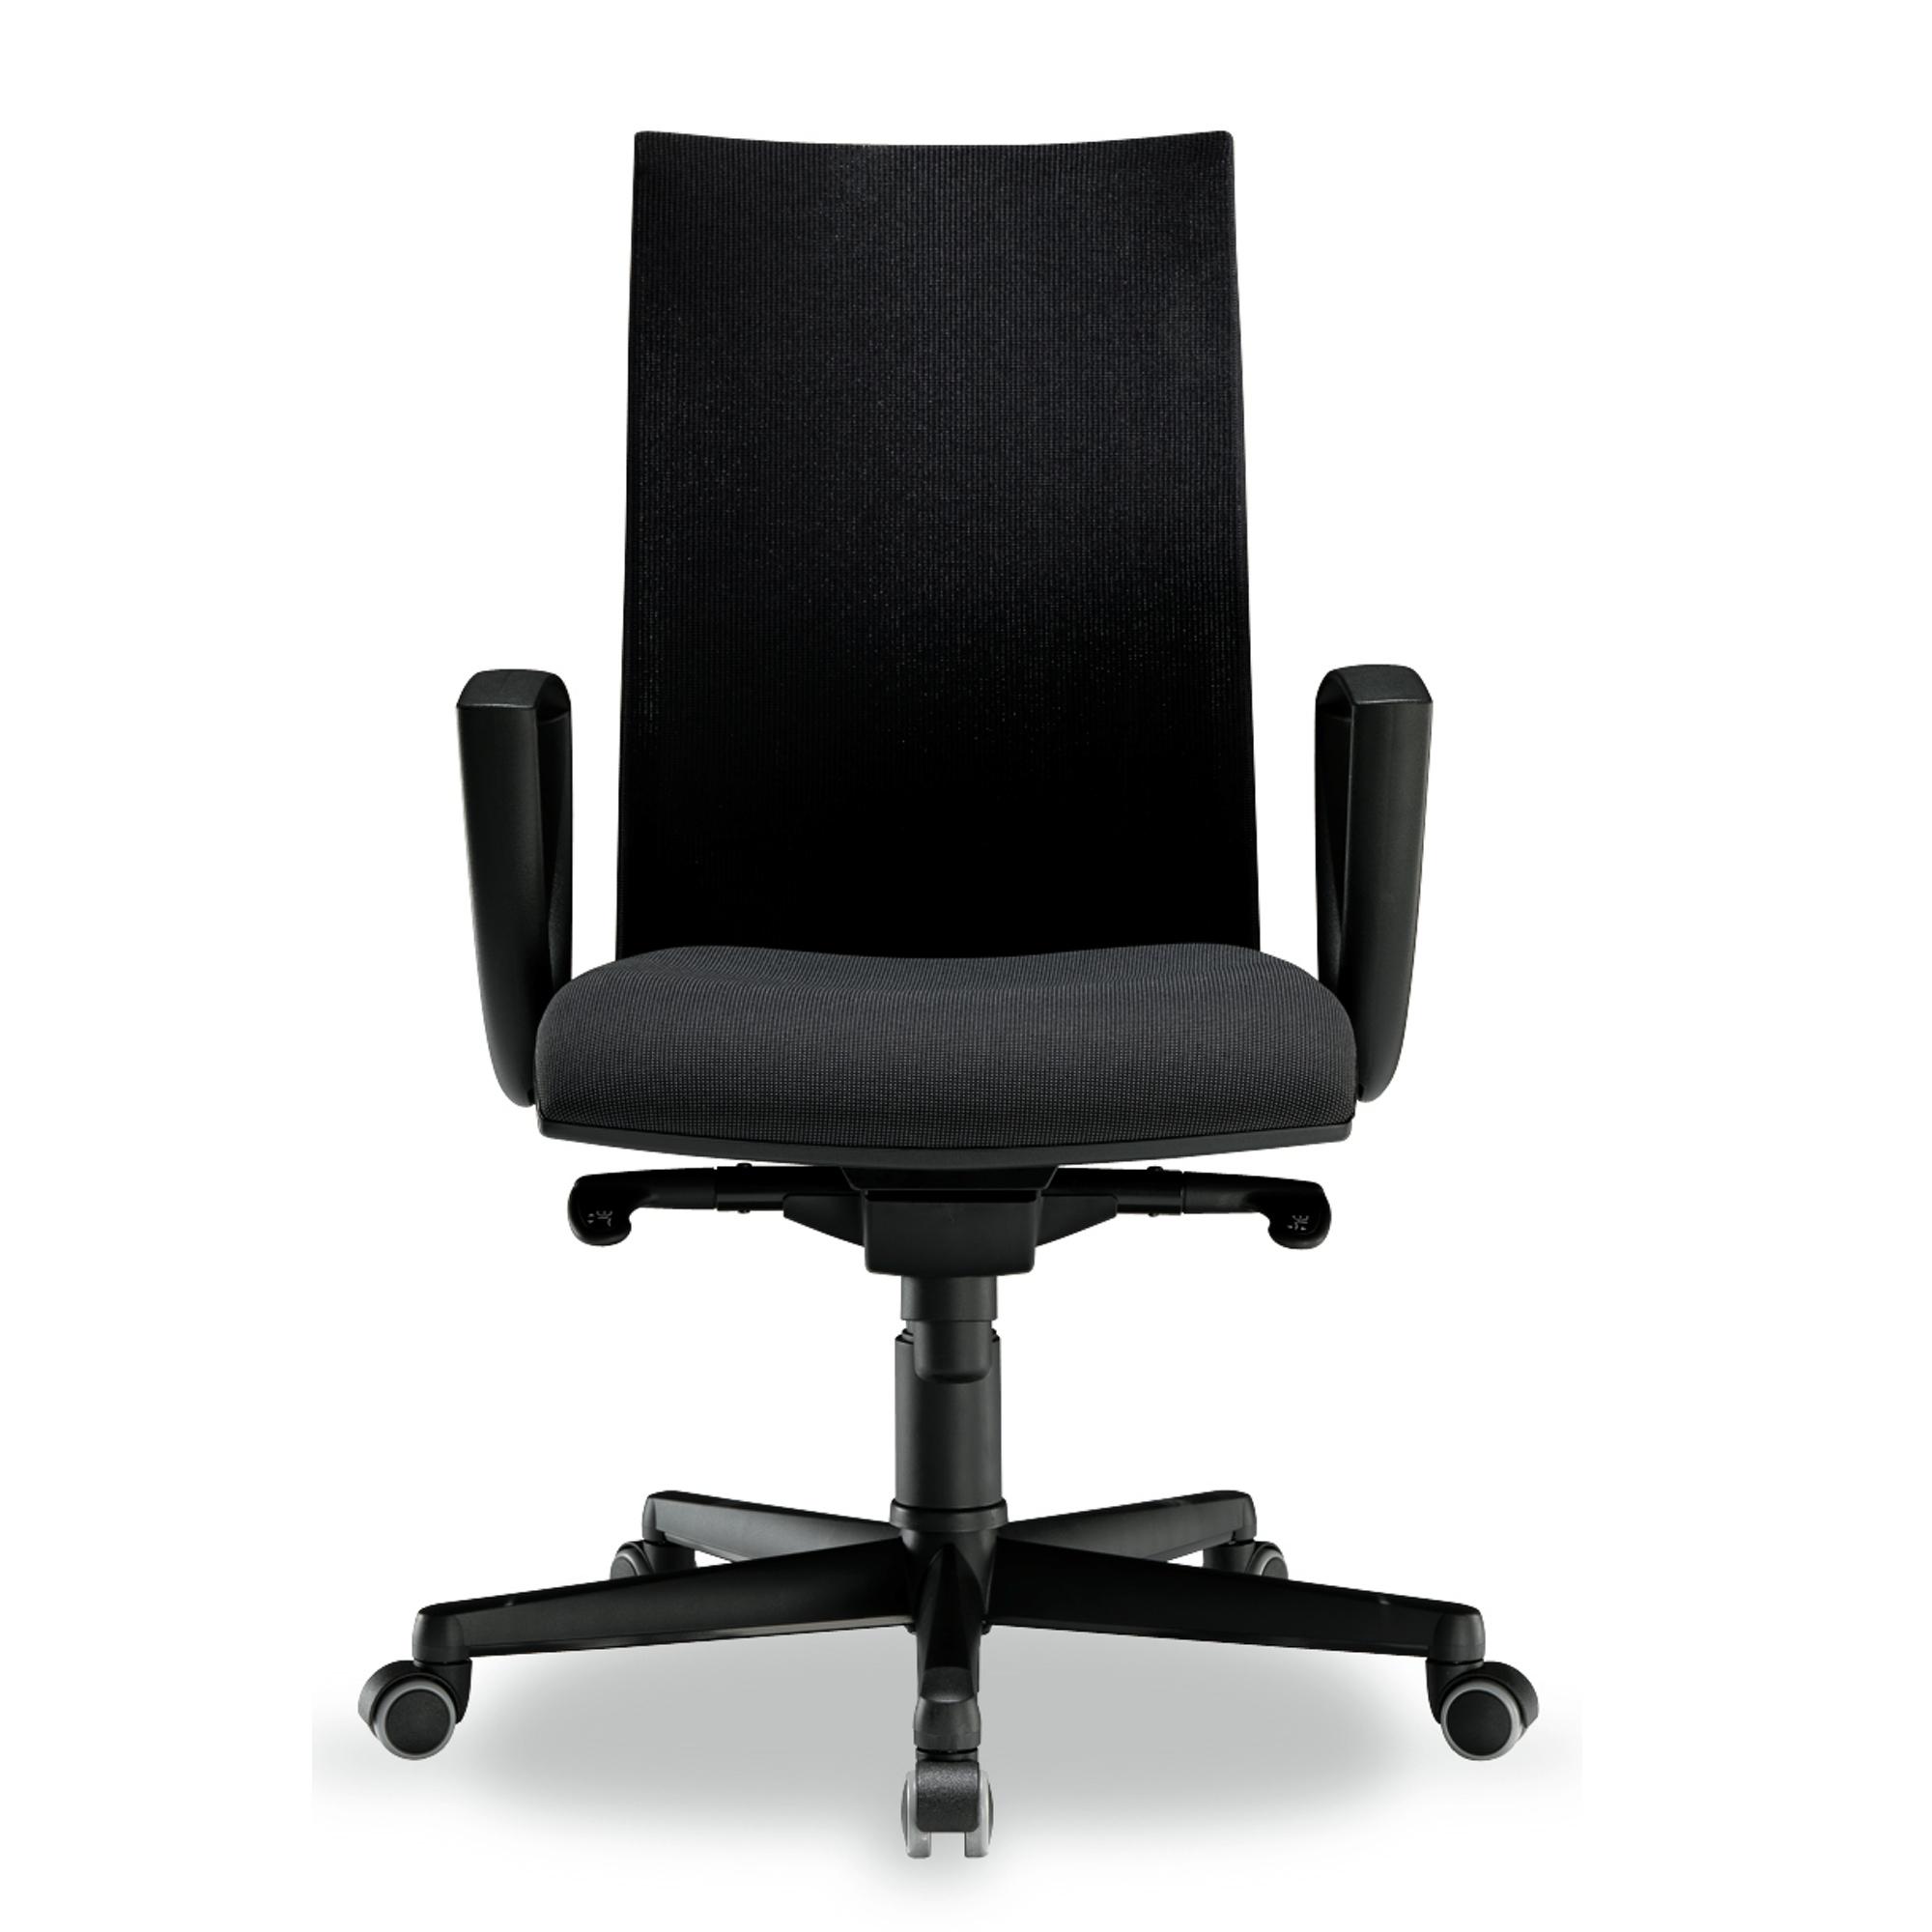 kastel kroma drehstuhl mit hohen r cken drehst hle arbeitsplatz b rost hle alle. Black Bedroom Furniture Sets. Home Design Ideas